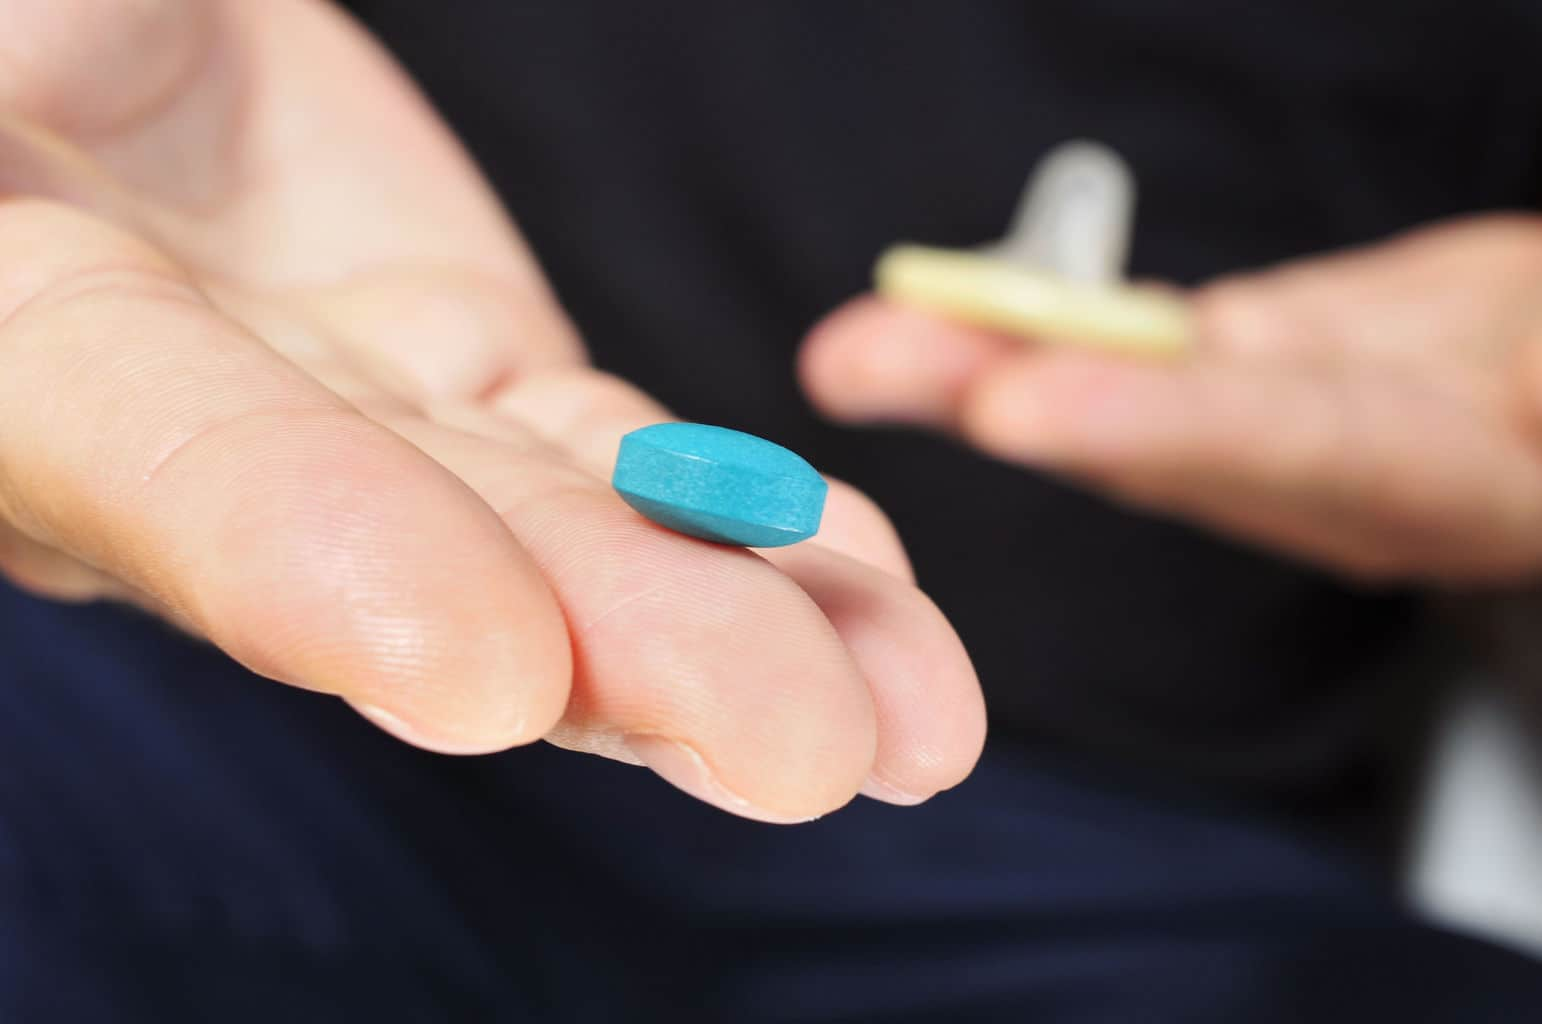 Erectile dysfunction drugs cause cancer